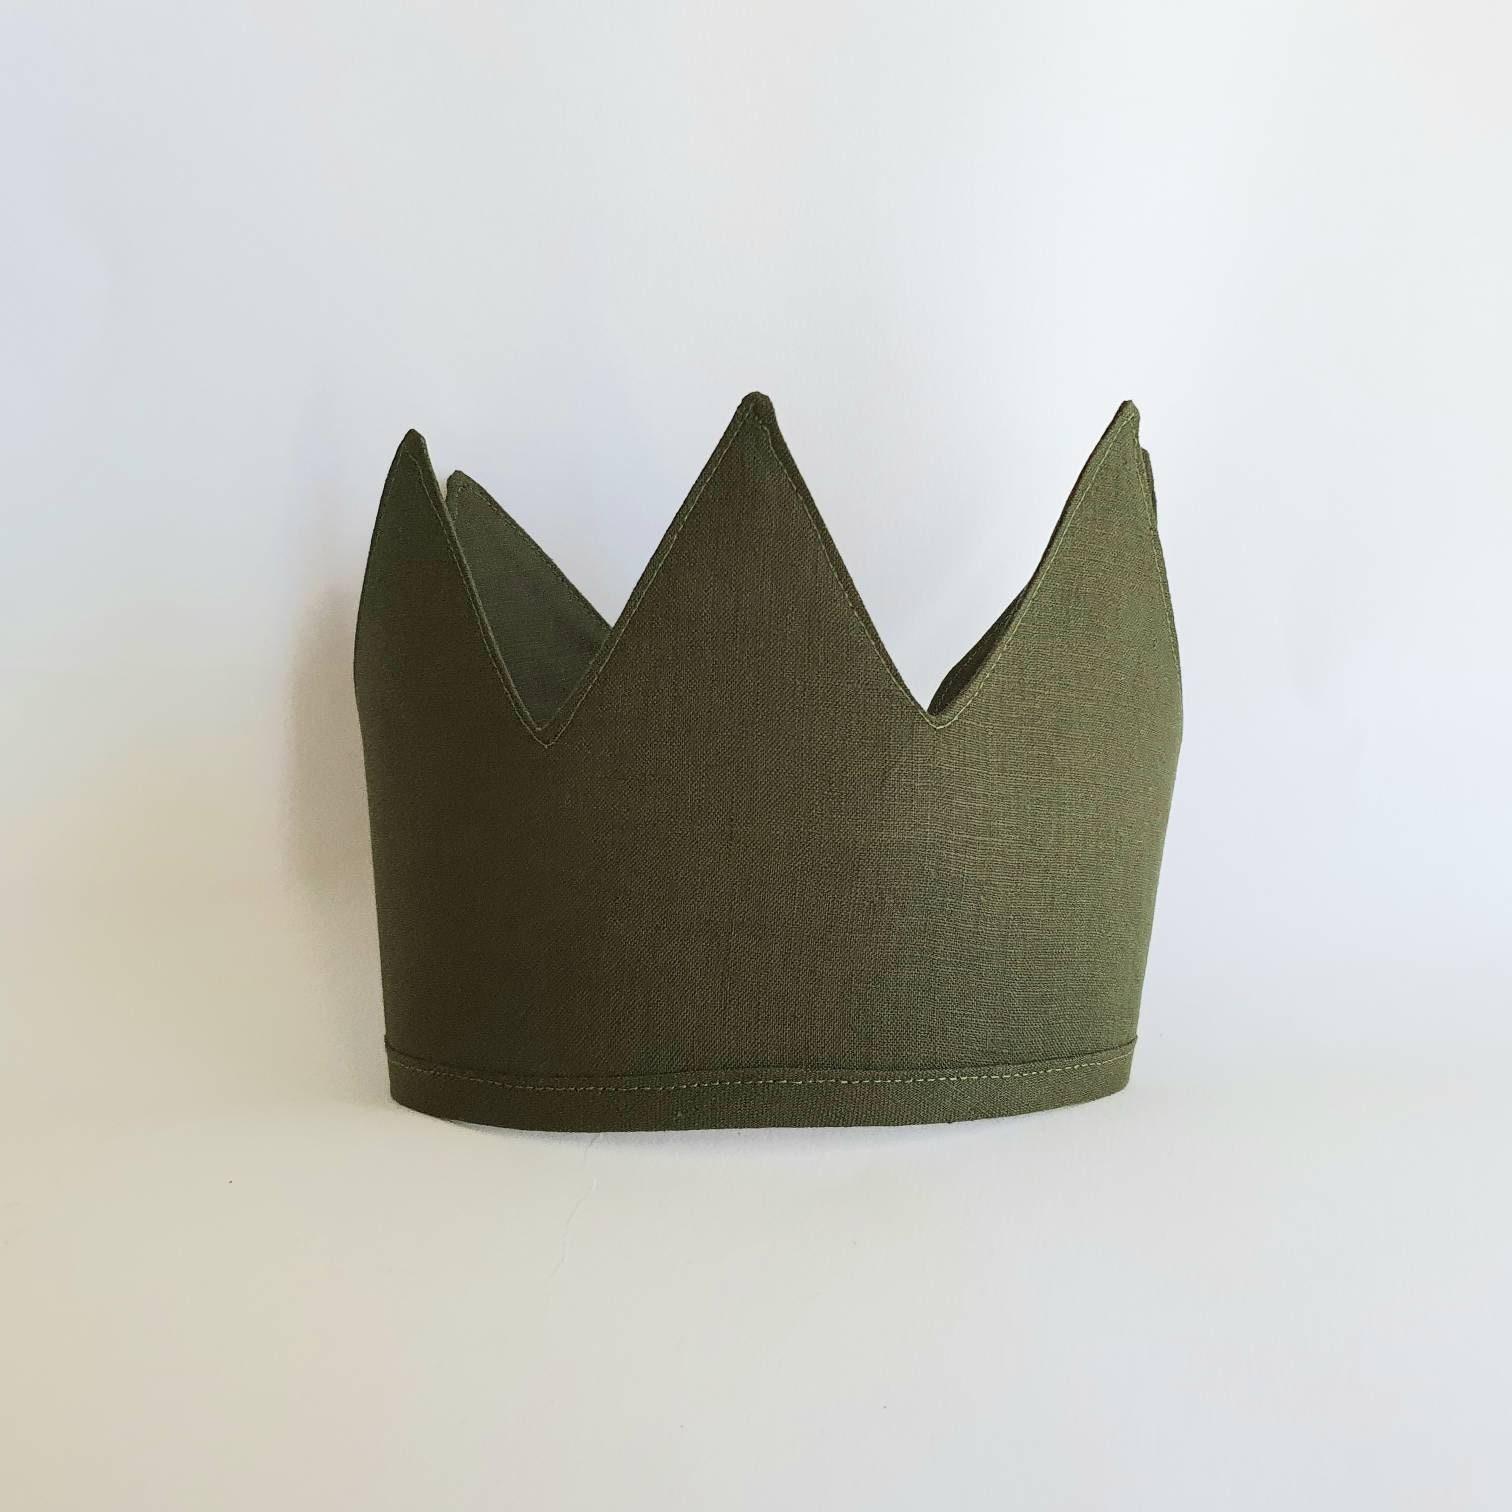 Bone Size Tall 1st Birthday Kids Crown Linen Crown Photo Prop Fabric Crown Birthday